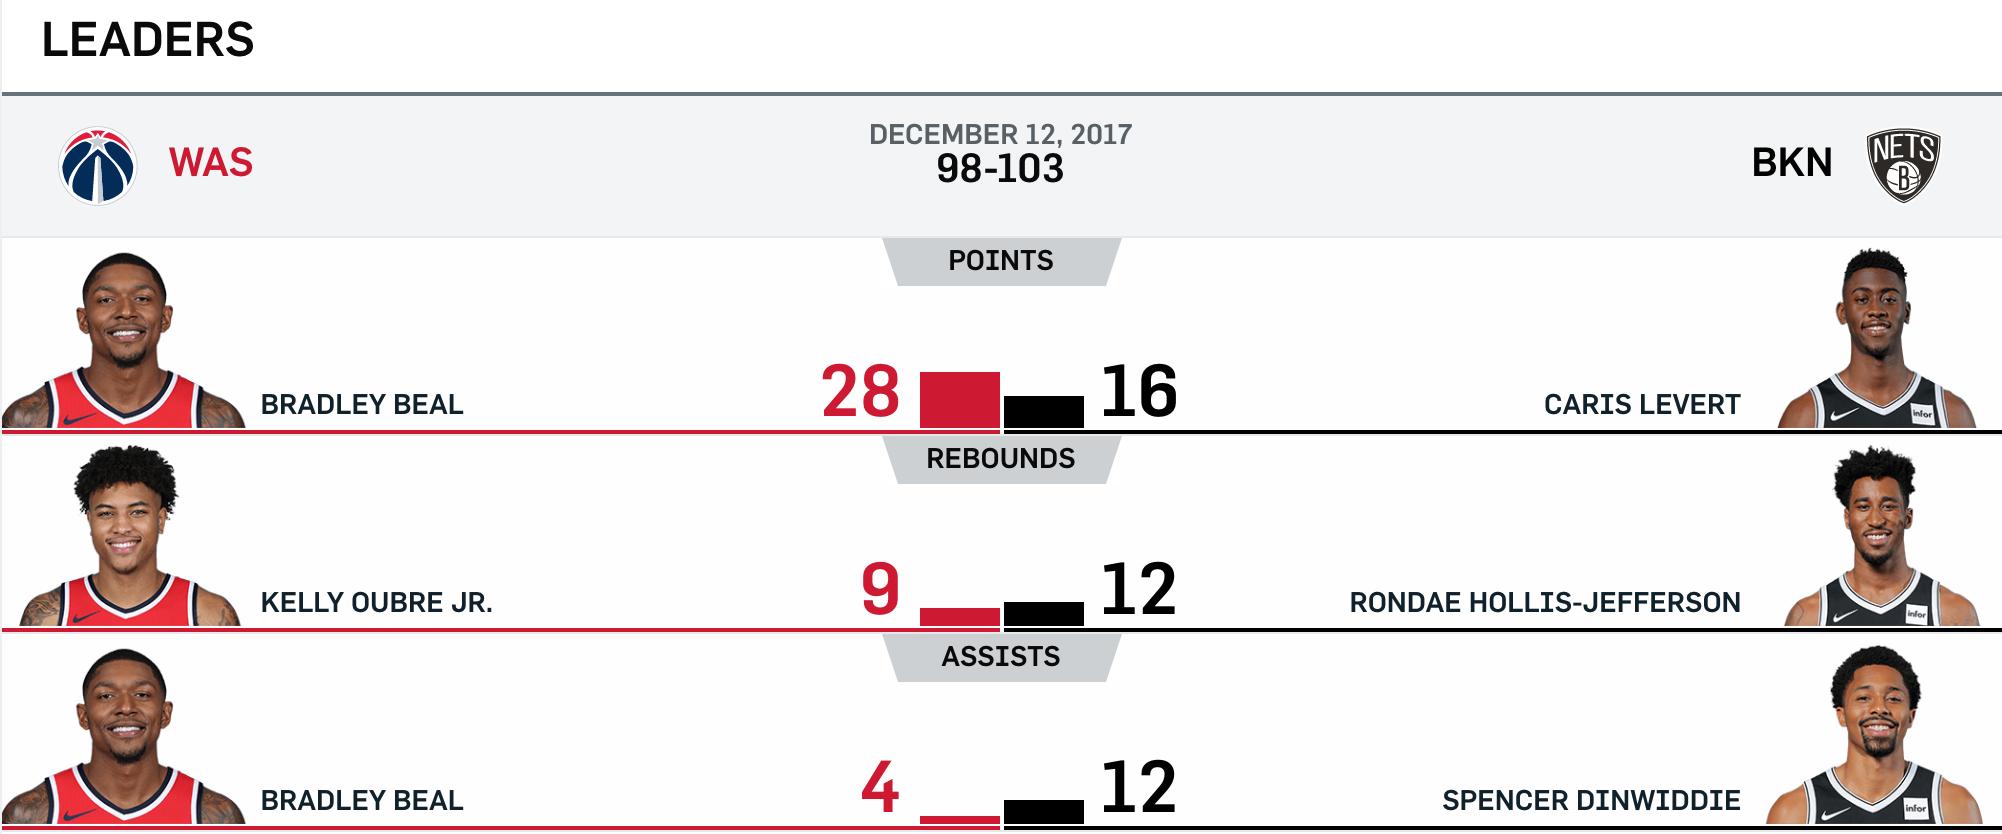 Nets vs Wizards 12-12-17 Leaders